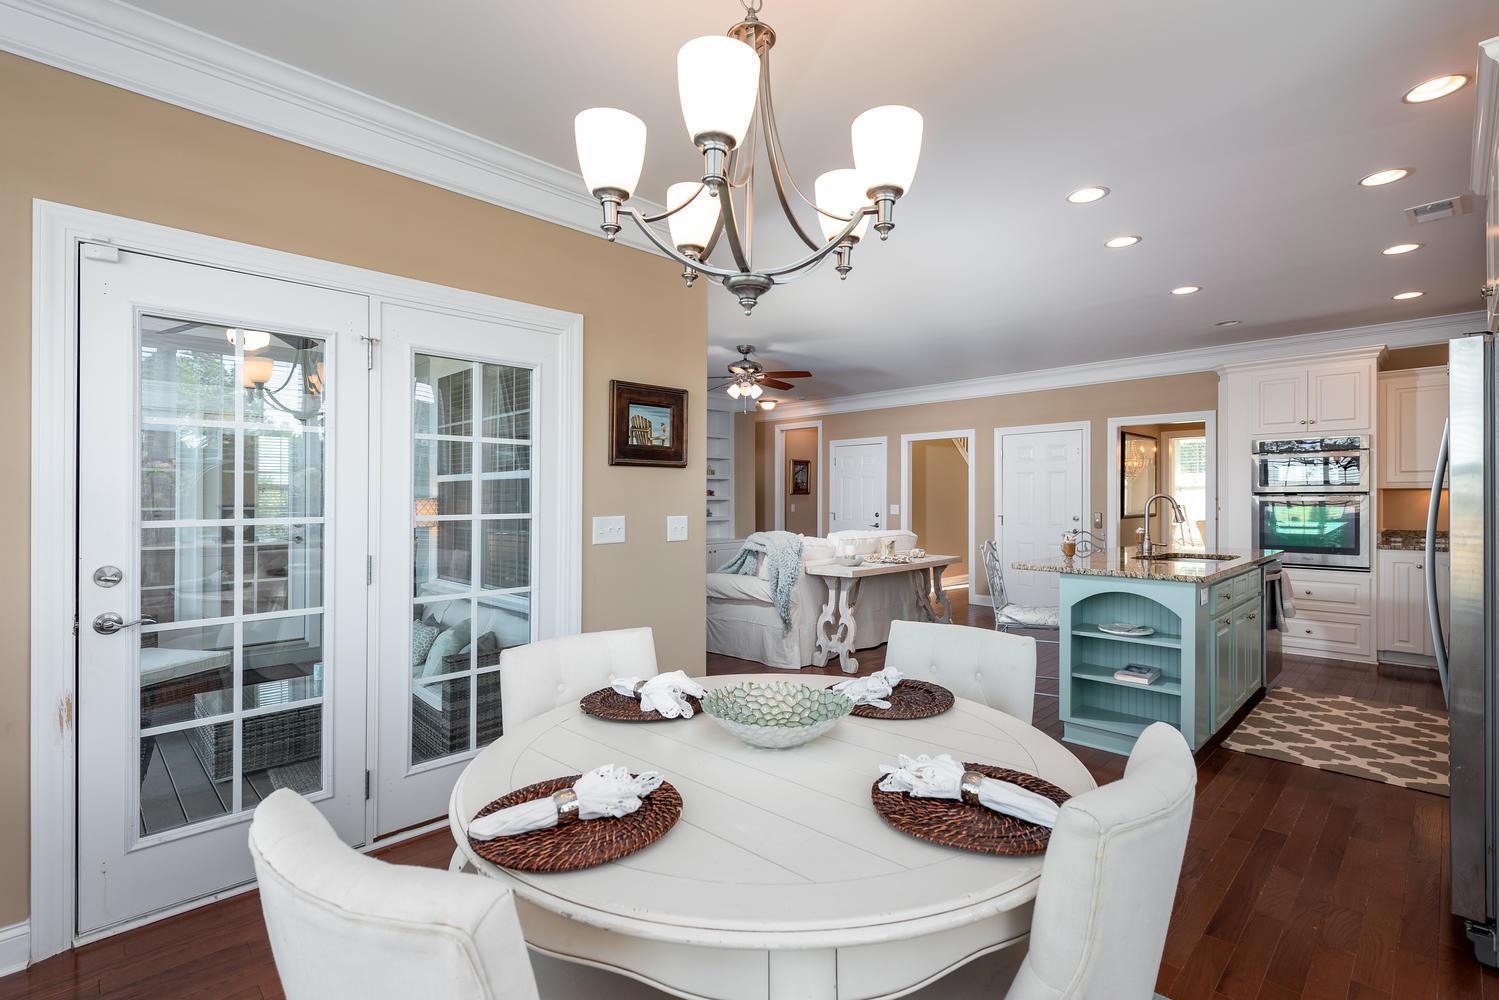 River Reach Pointe Homes For Sale - 1216 Rivers Reach Drive, Charleston, SC - 0